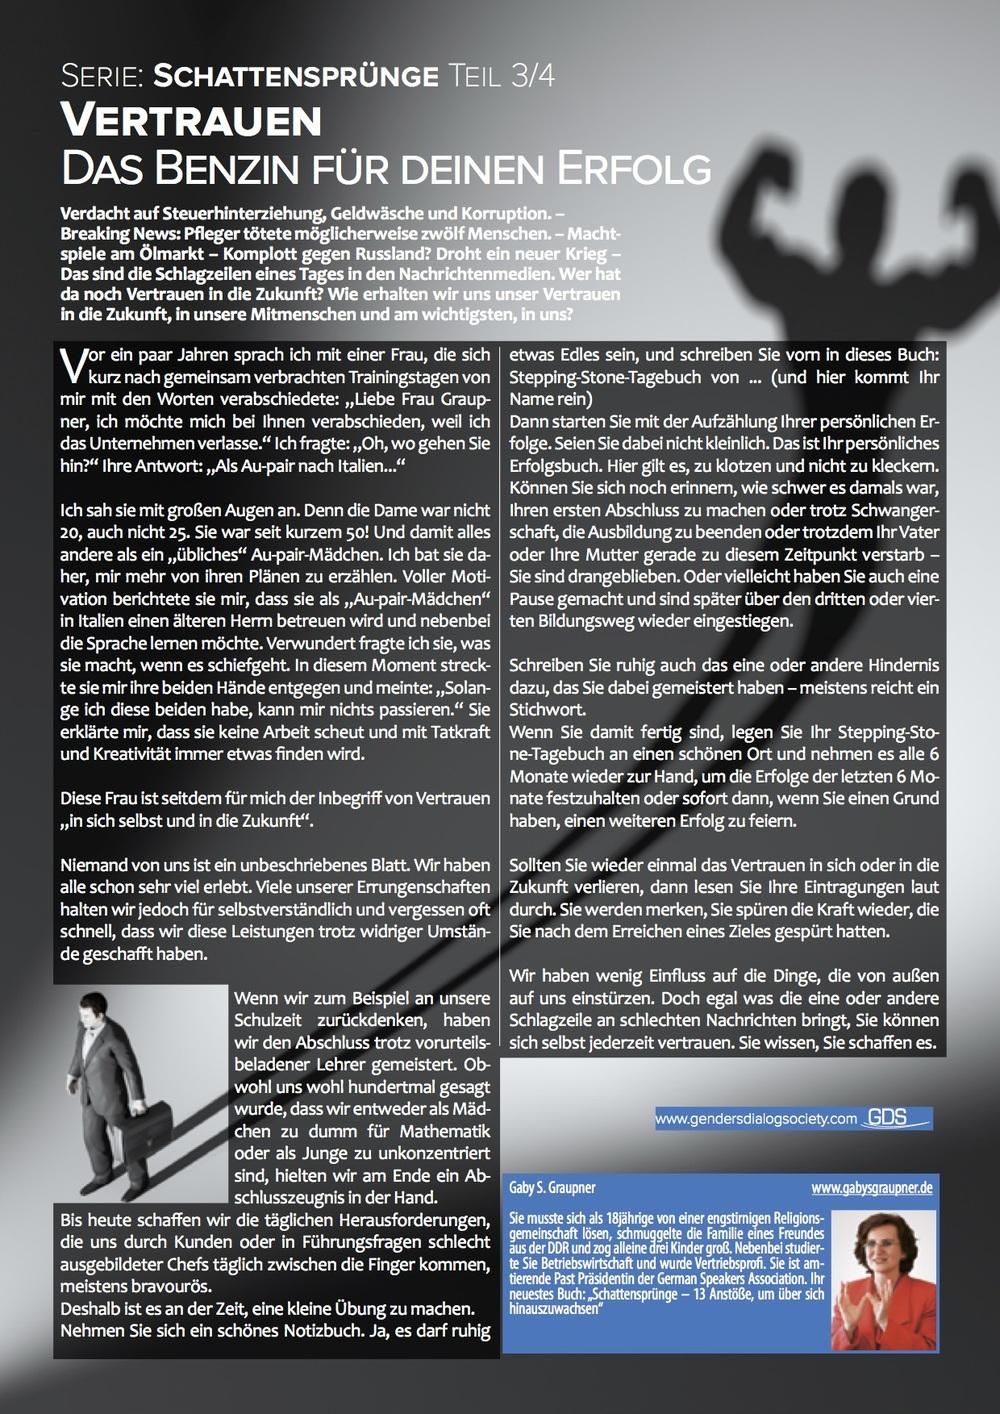 Genders Dialog Das Magazin - Ausgabe Dezember 2014